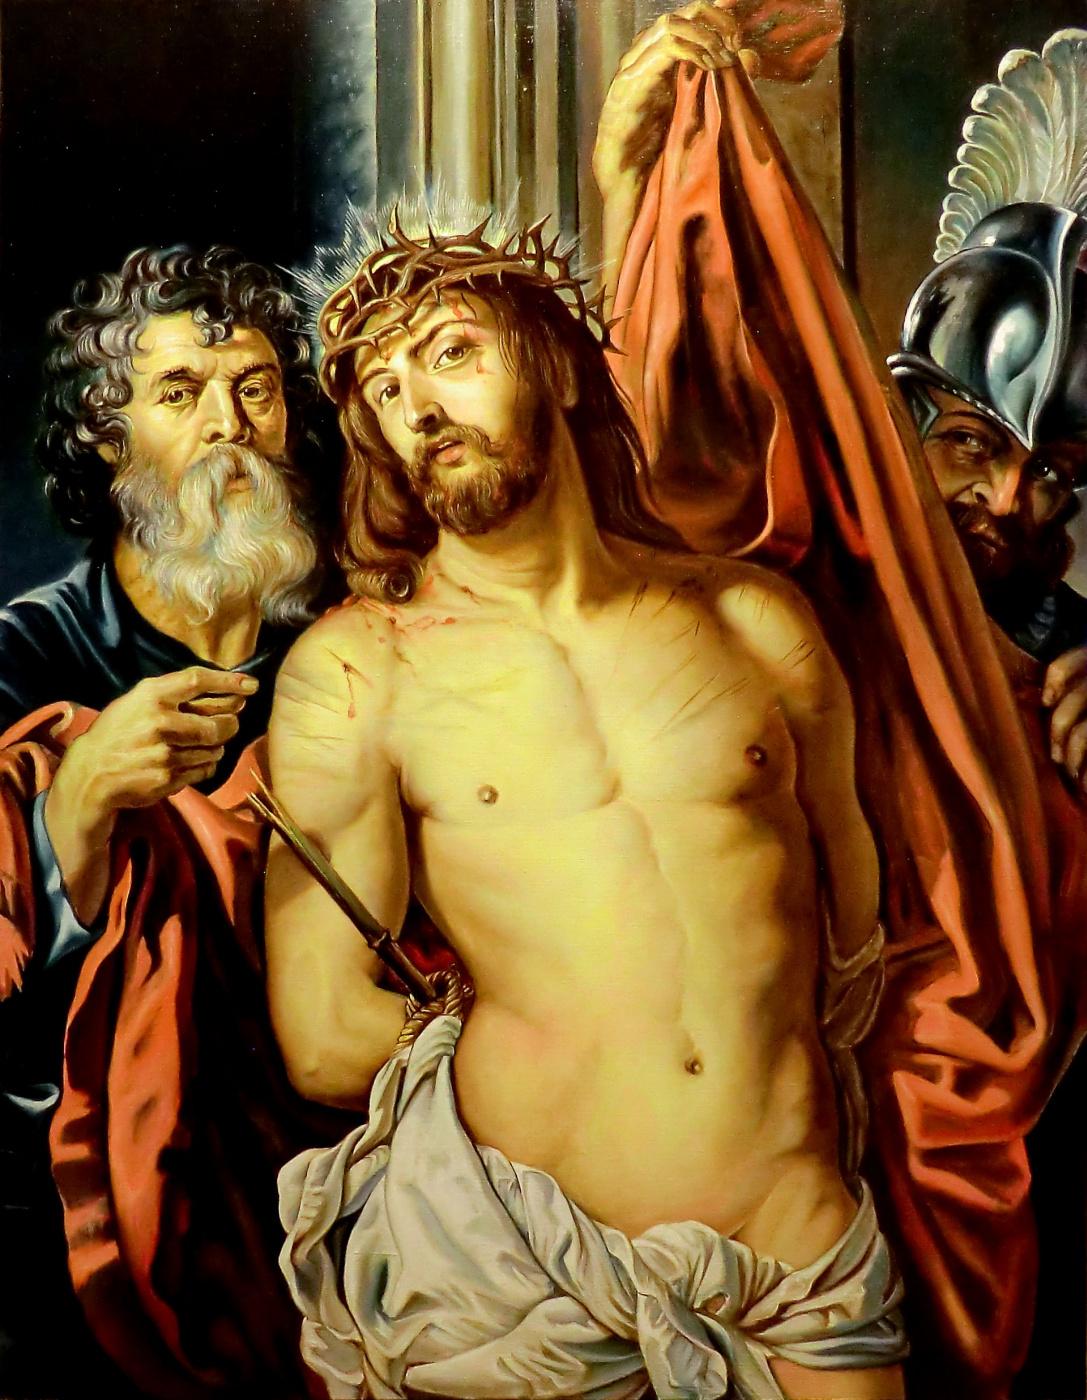 Valery Vasilyevich Litvinov. Christ in the crown of thorns (copy of Rubens)